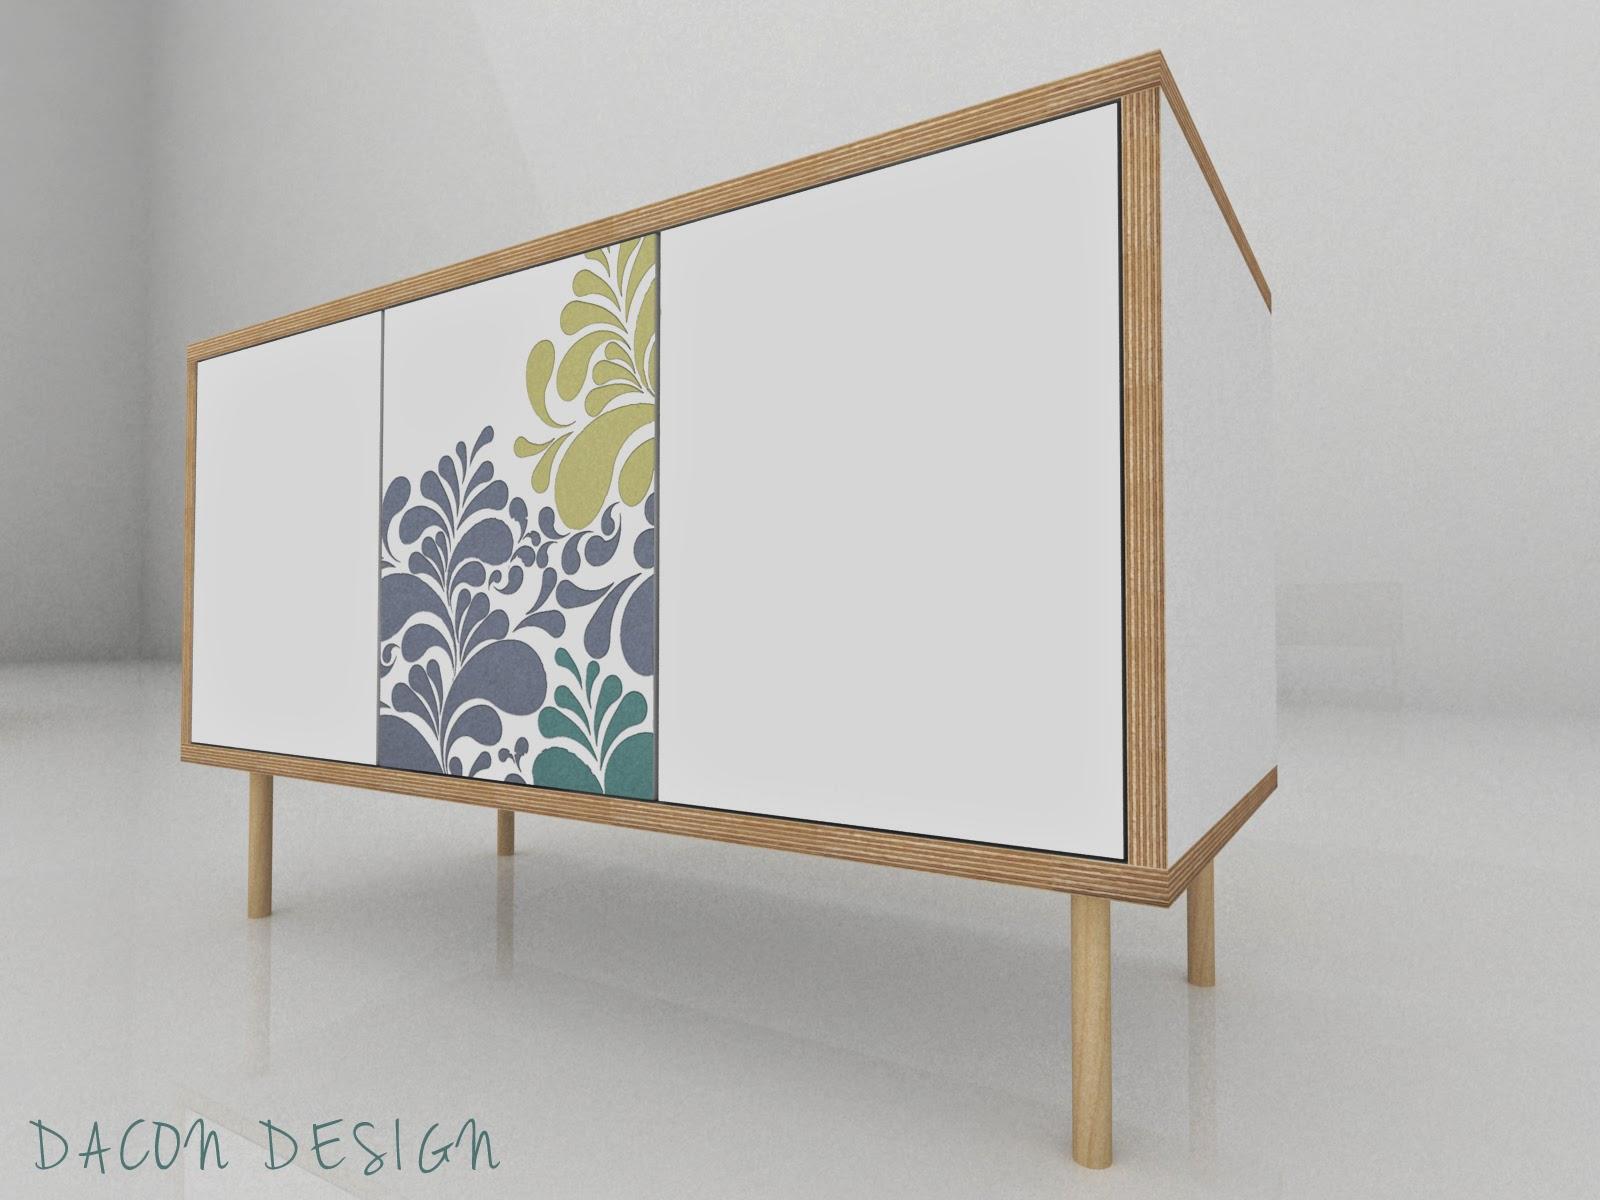 Dacon-Design-wnetrza-blog-komoda-sklejka-pastele